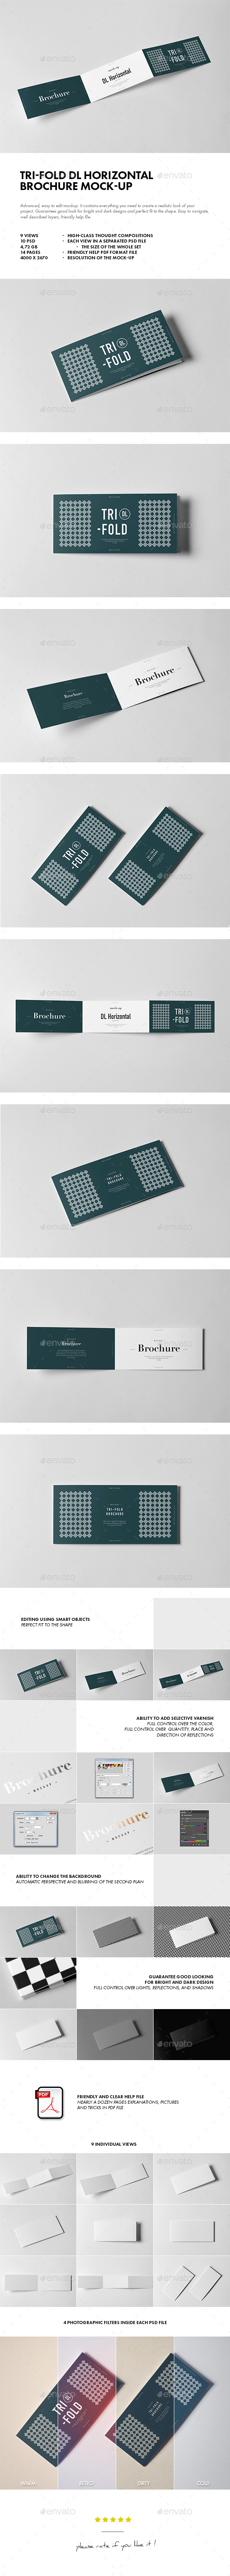 Tri-Fold DL Horizontal Brochure Mock-up - Brochures Print